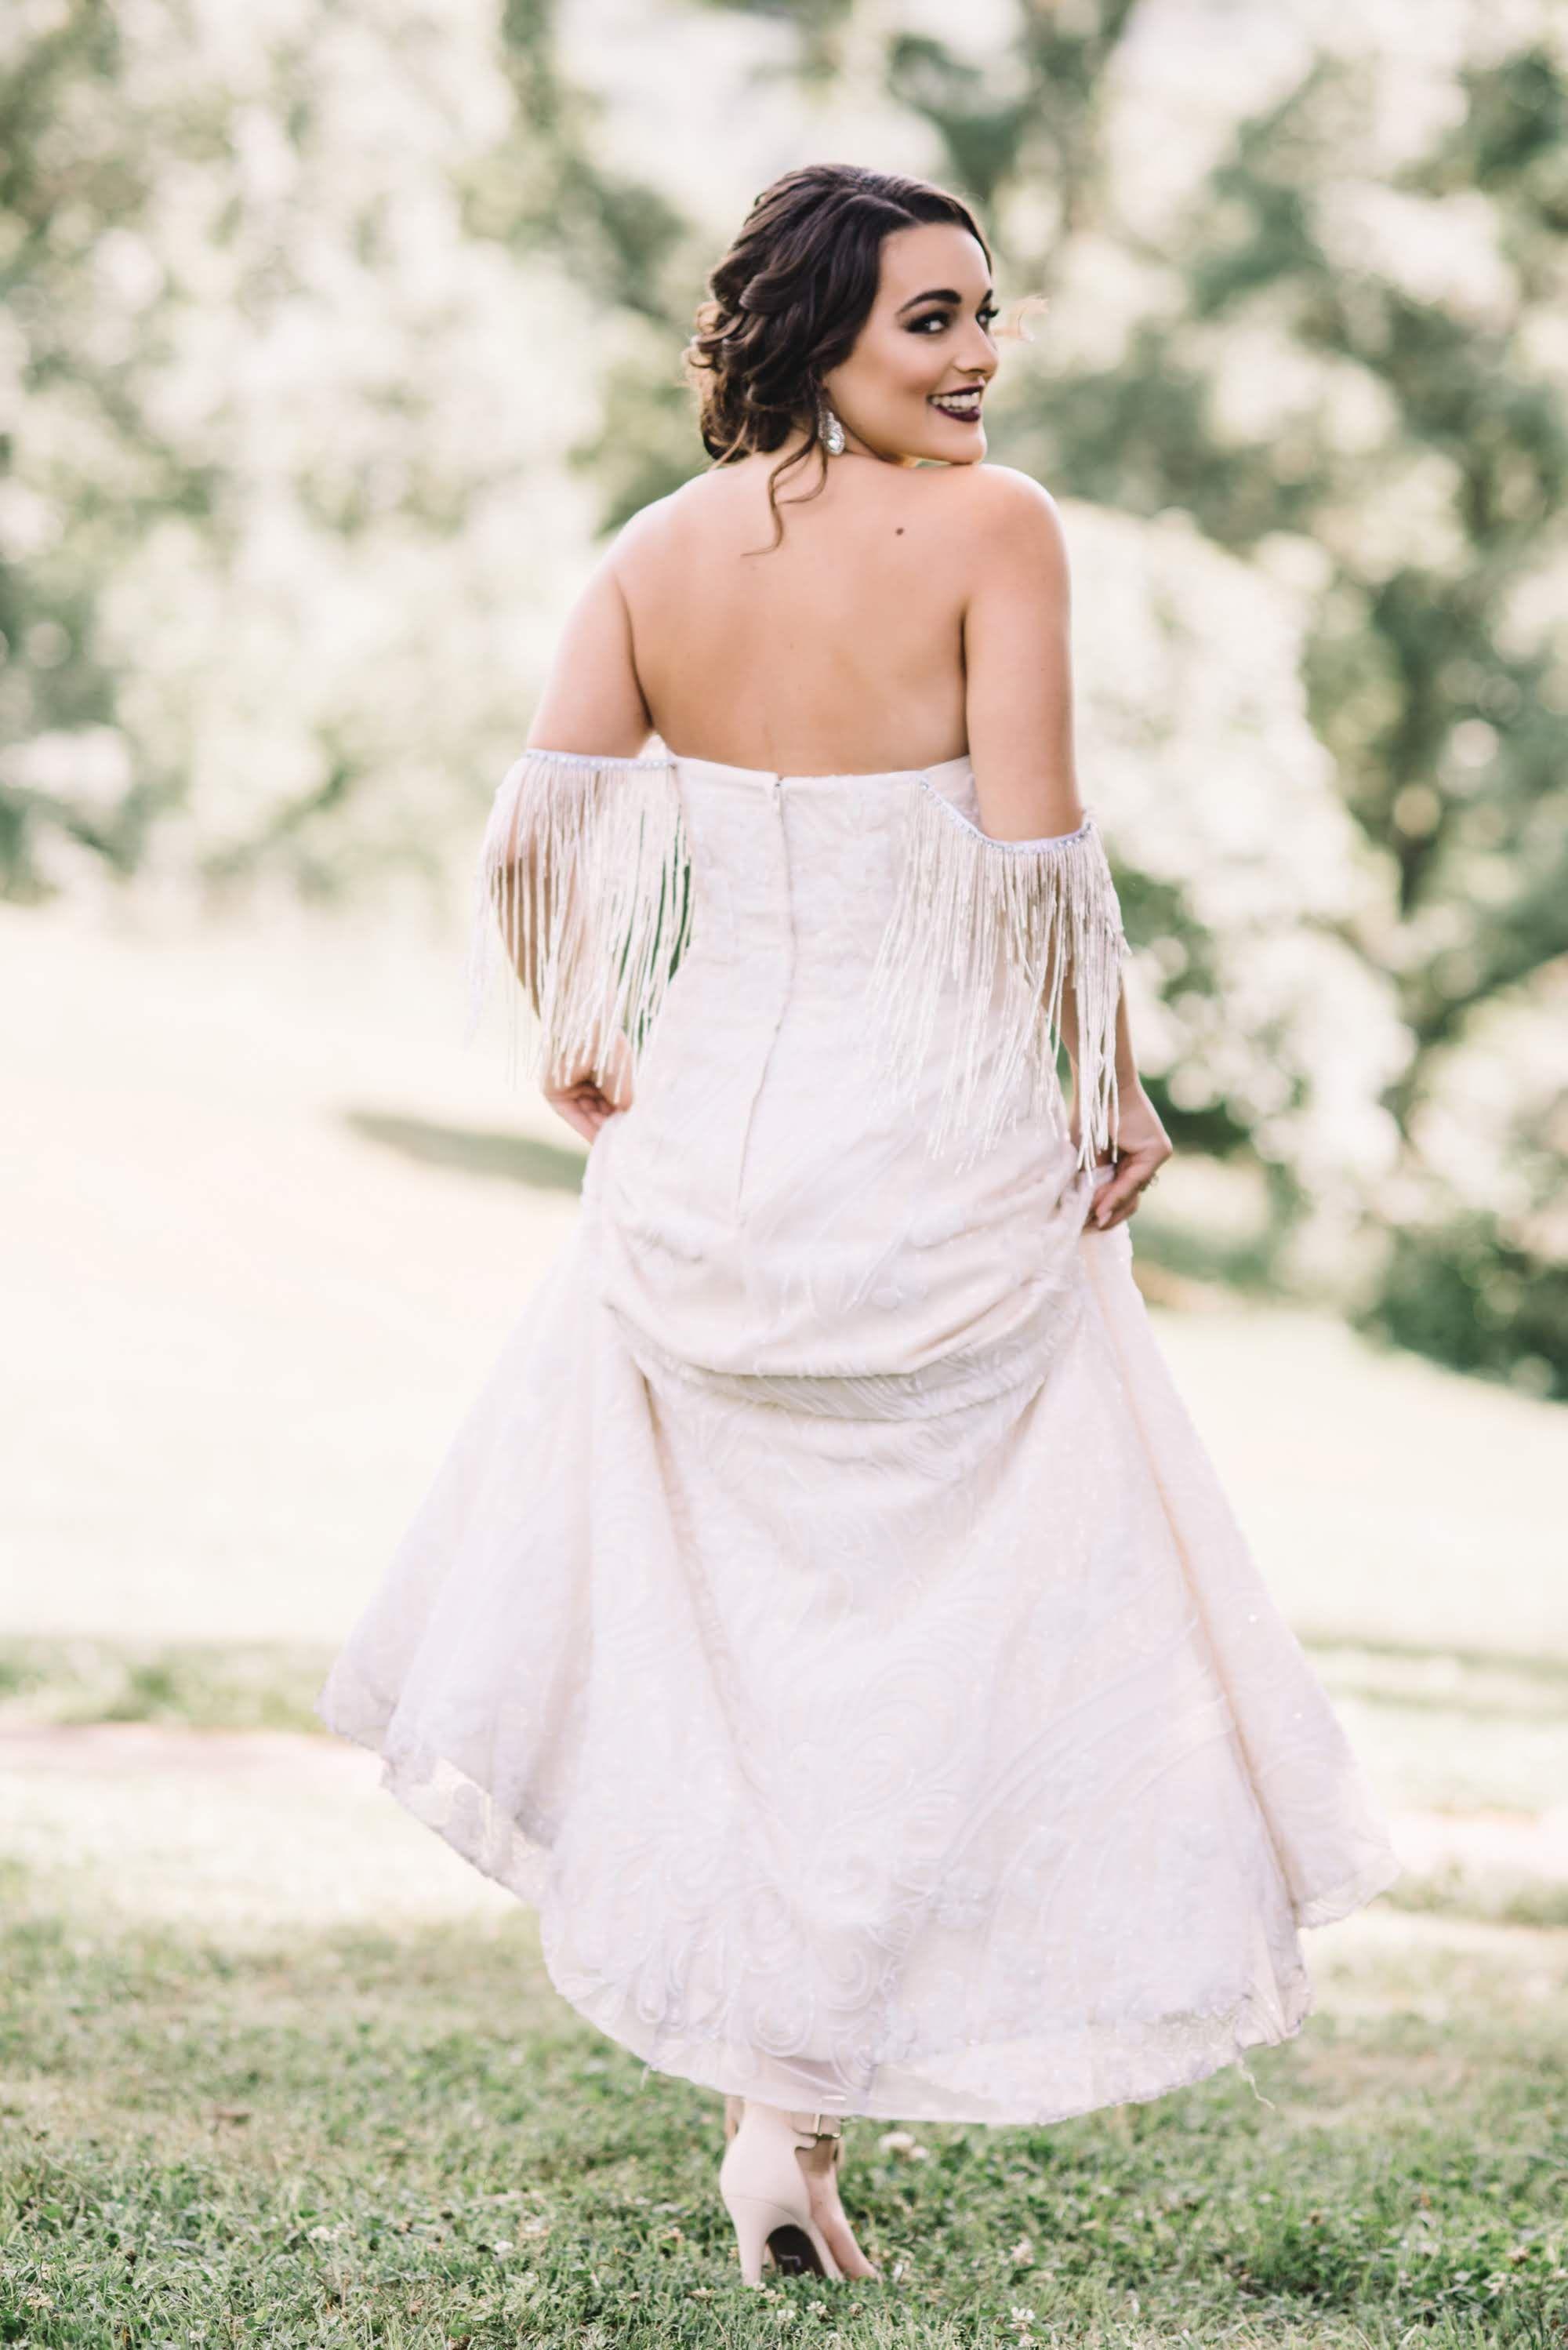 Didomenico Designs Creates Custom Couture Gowns To Fit A Bridetobe Dress Dreams Body